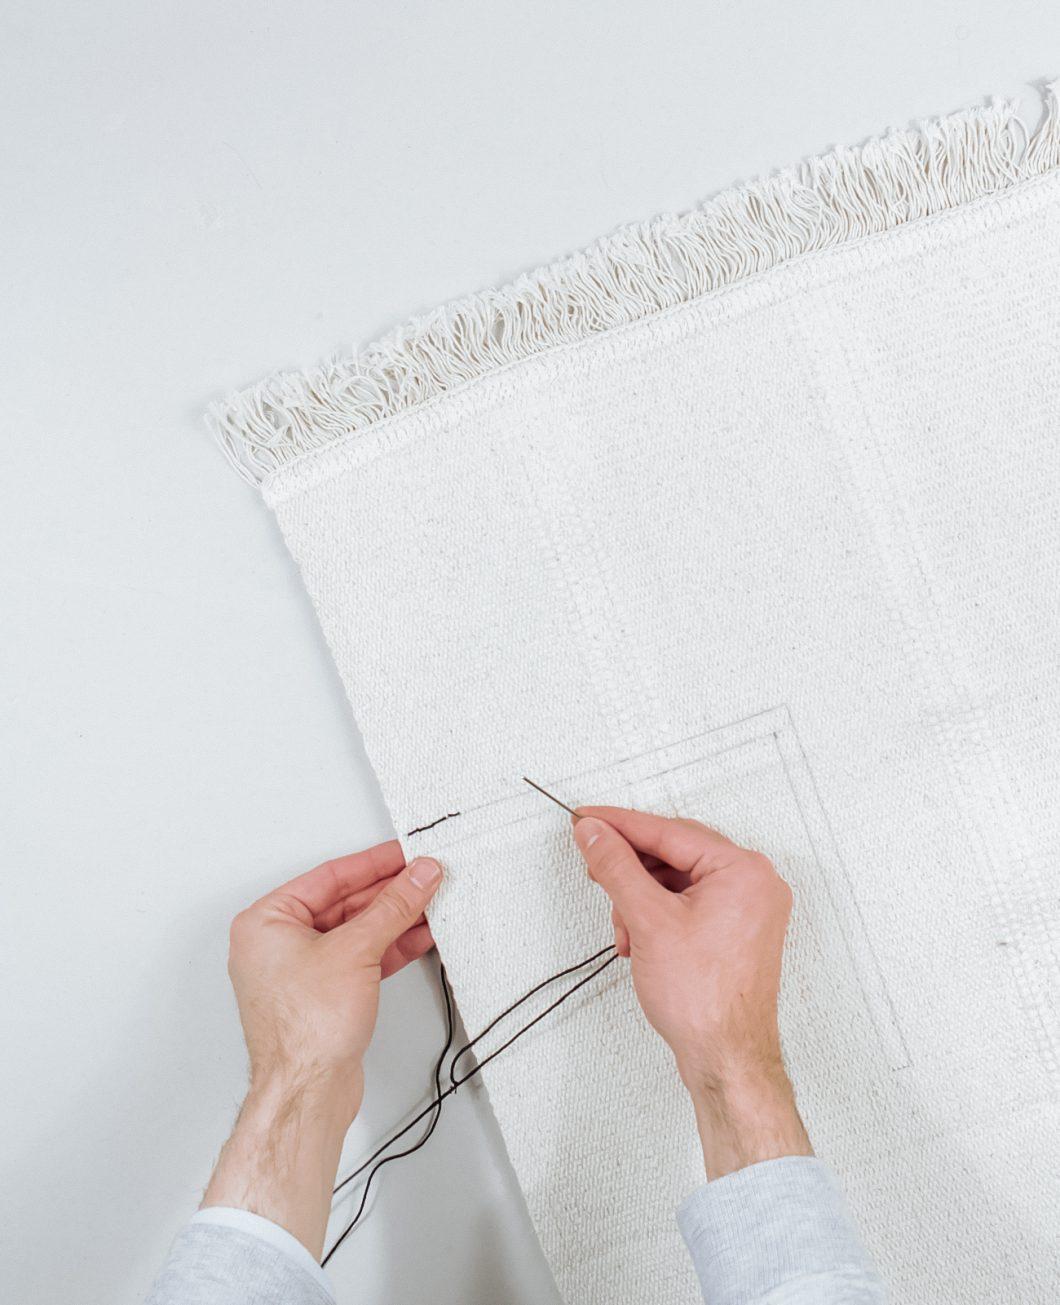 tapis deco murale boheme broderie Ikea Hack tuto dia etape 2